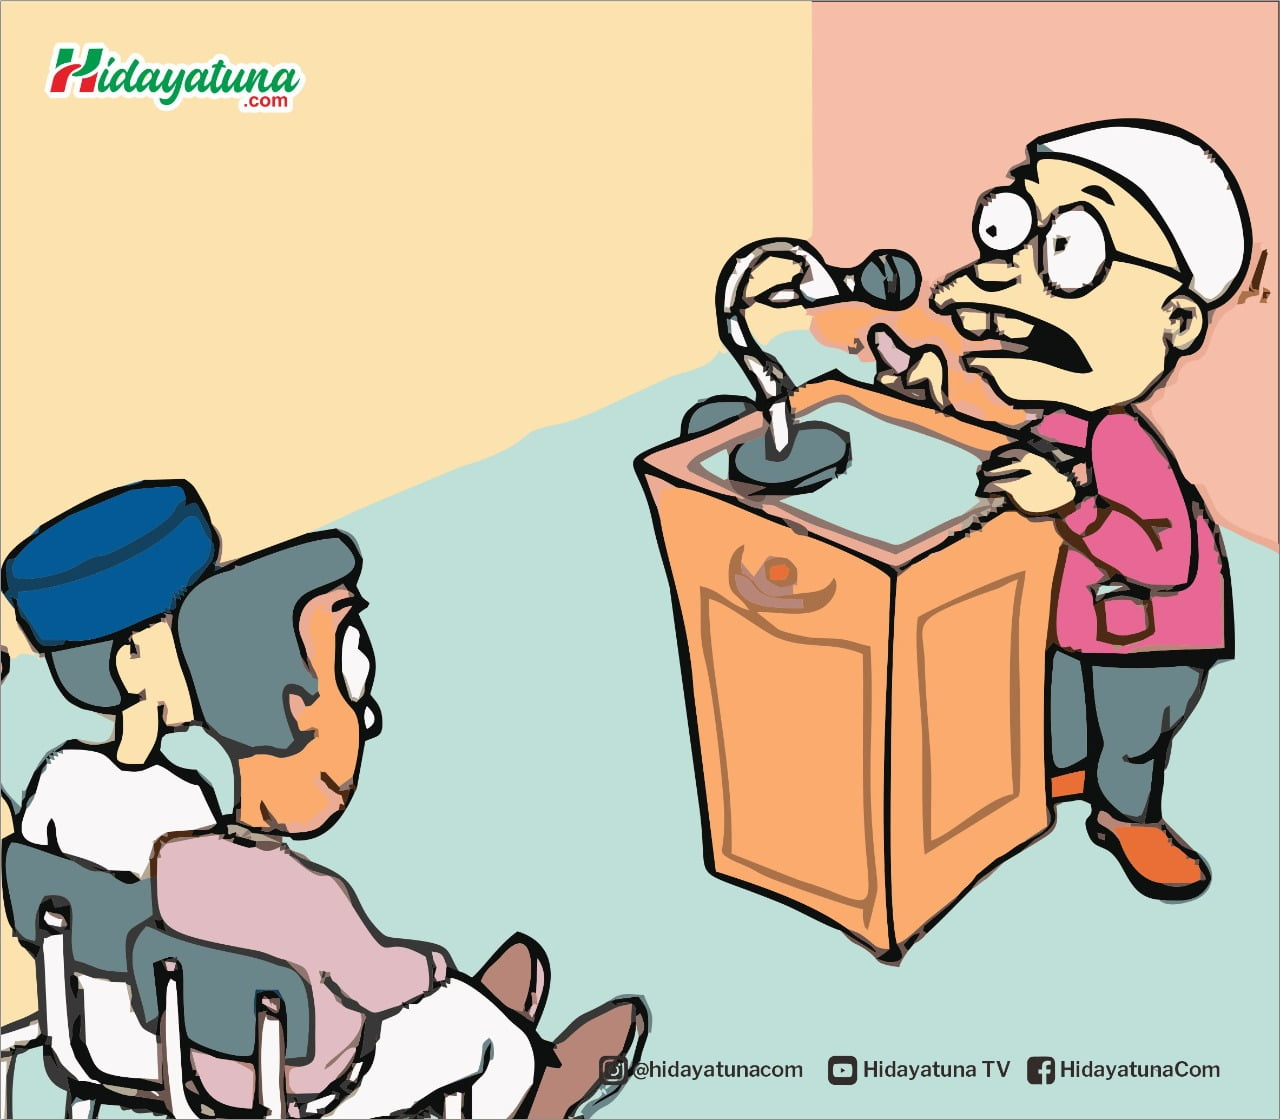 Nahi Mungkar dan Dakwah Progresif (Ilustrasi/Hidayatuna)